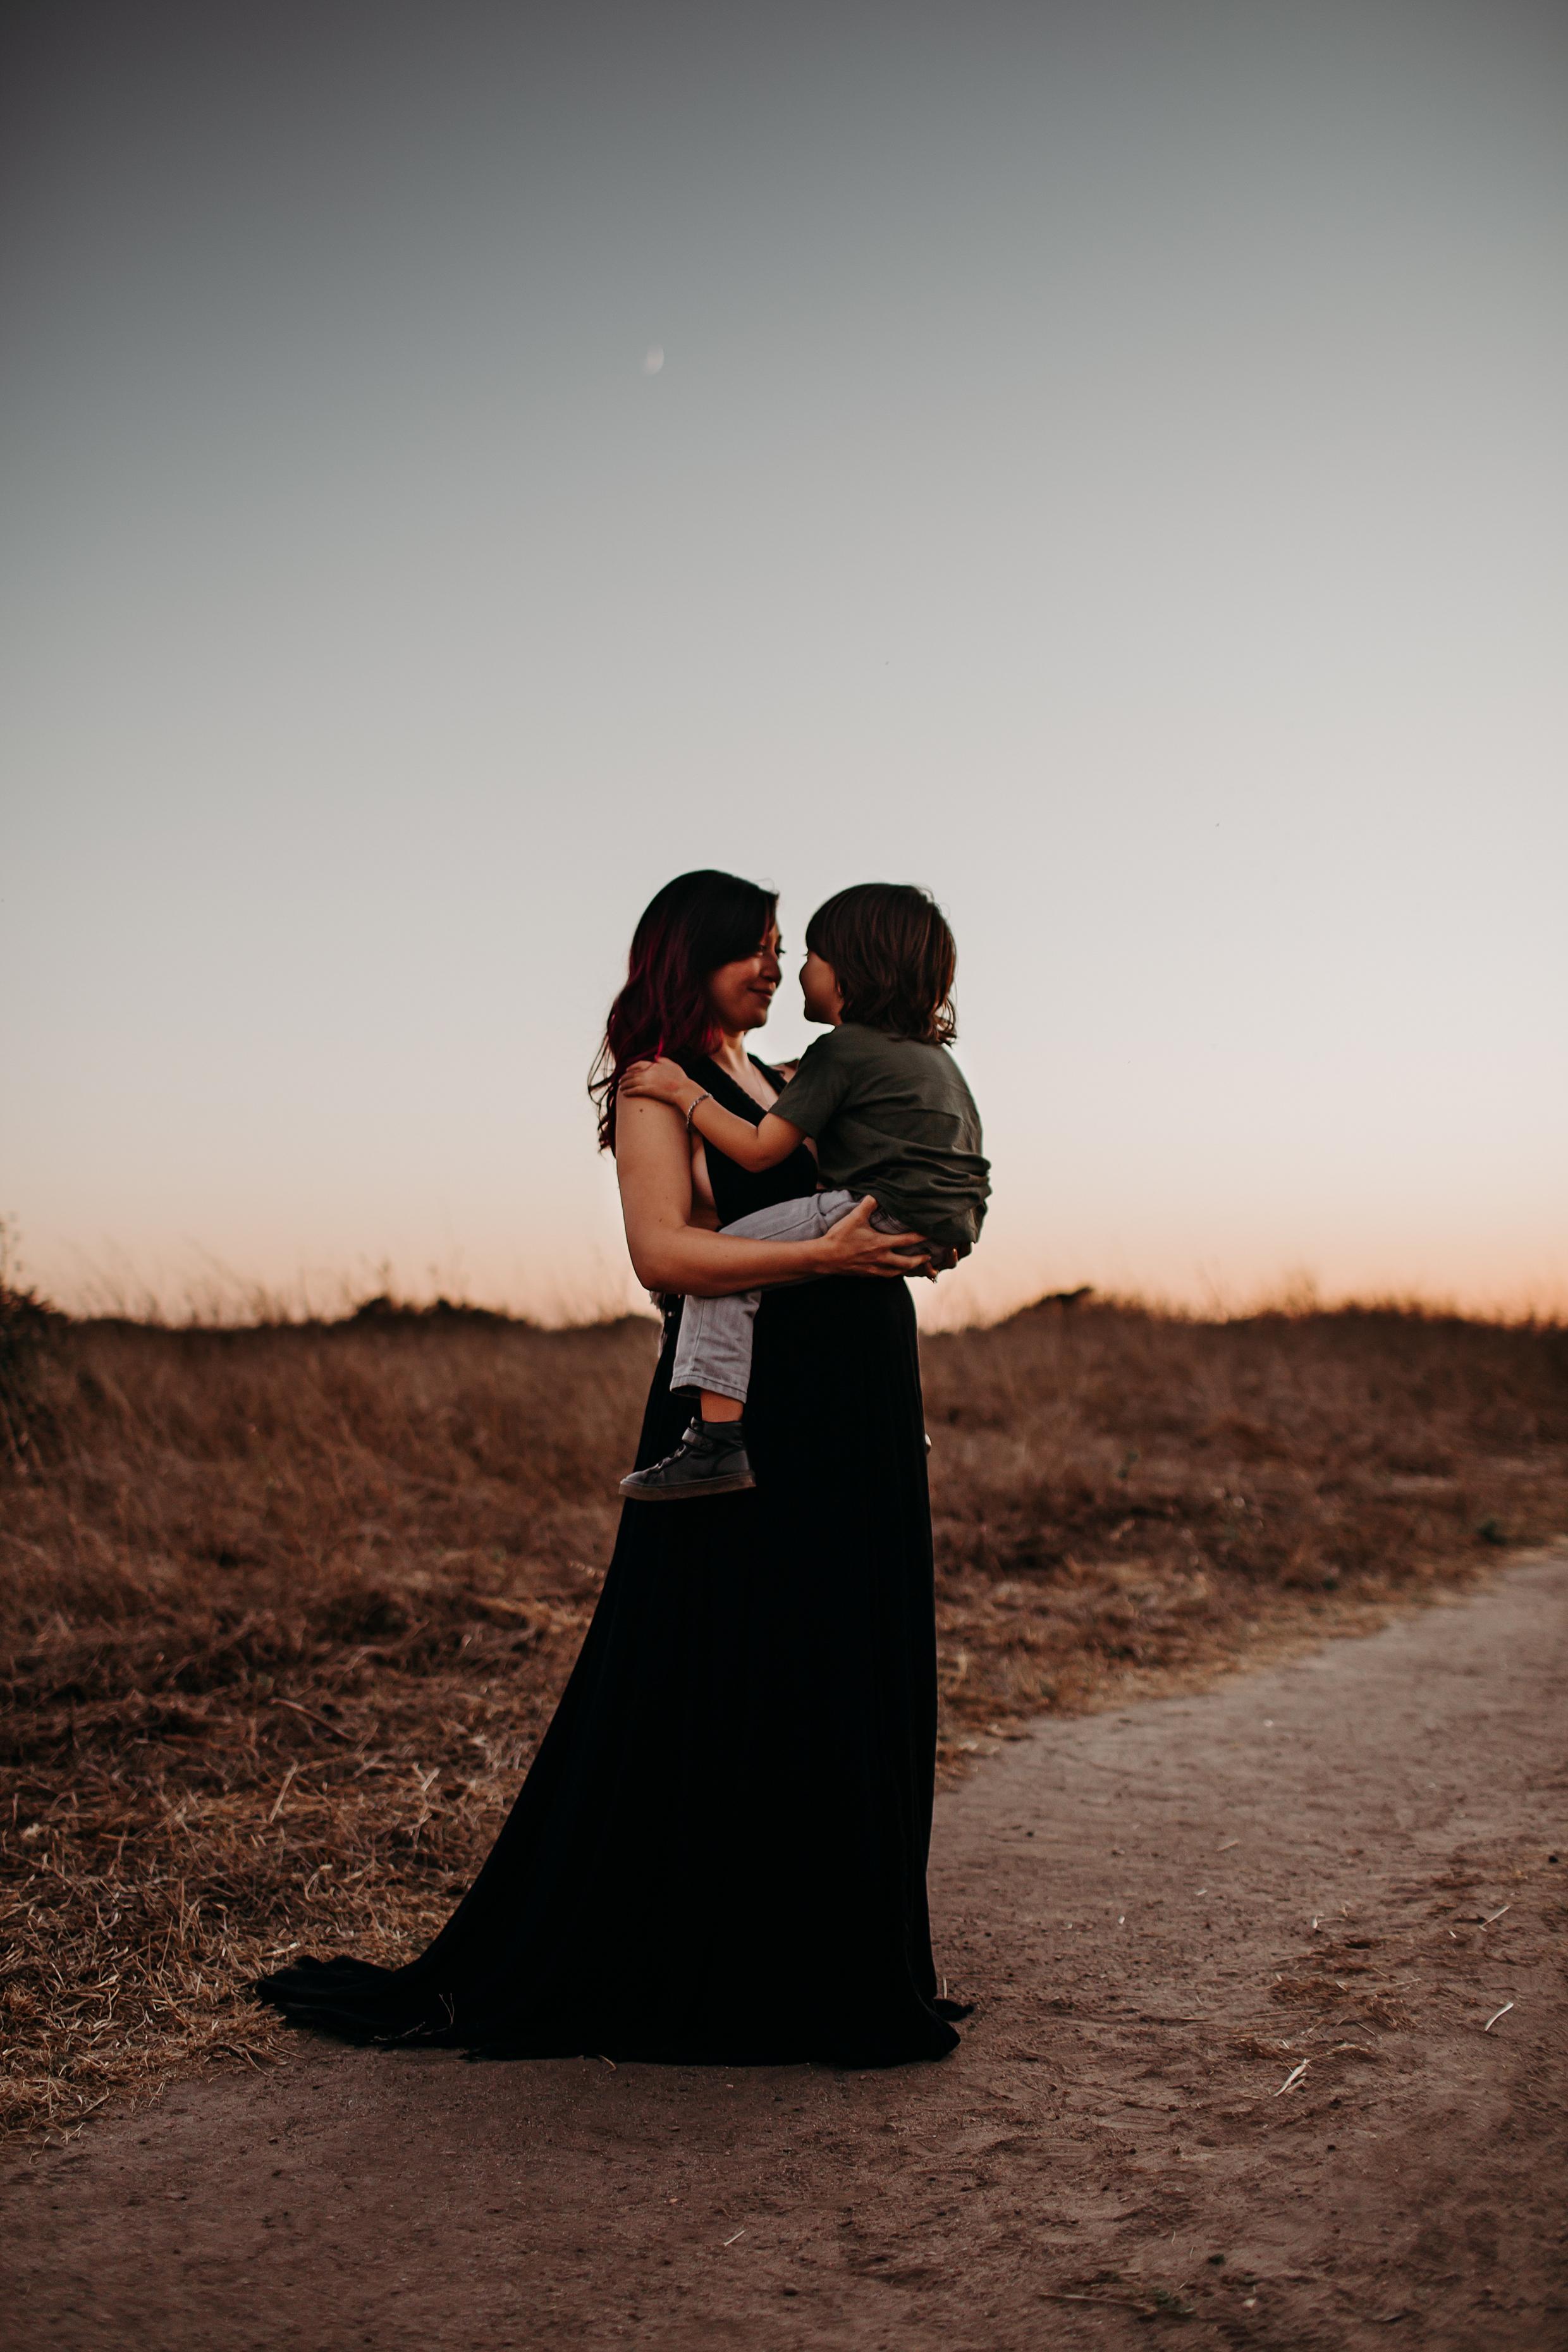 Bryanna-San-Antonio-Maternity-Photographer-112_WEB.jpg